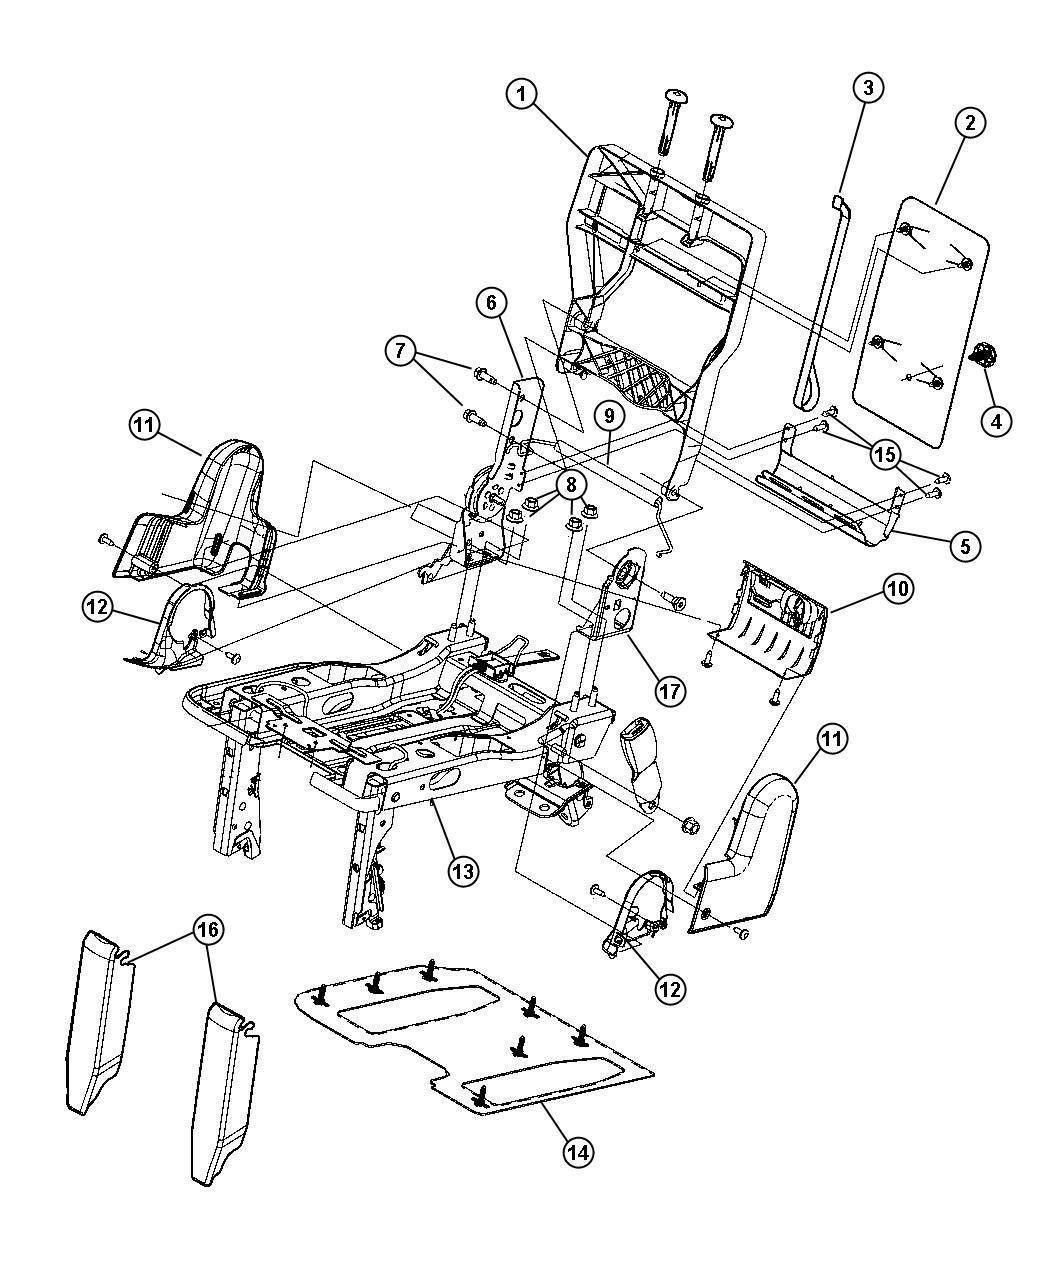 lt1 camaro heater hose diagram newhairstylesformen2014com